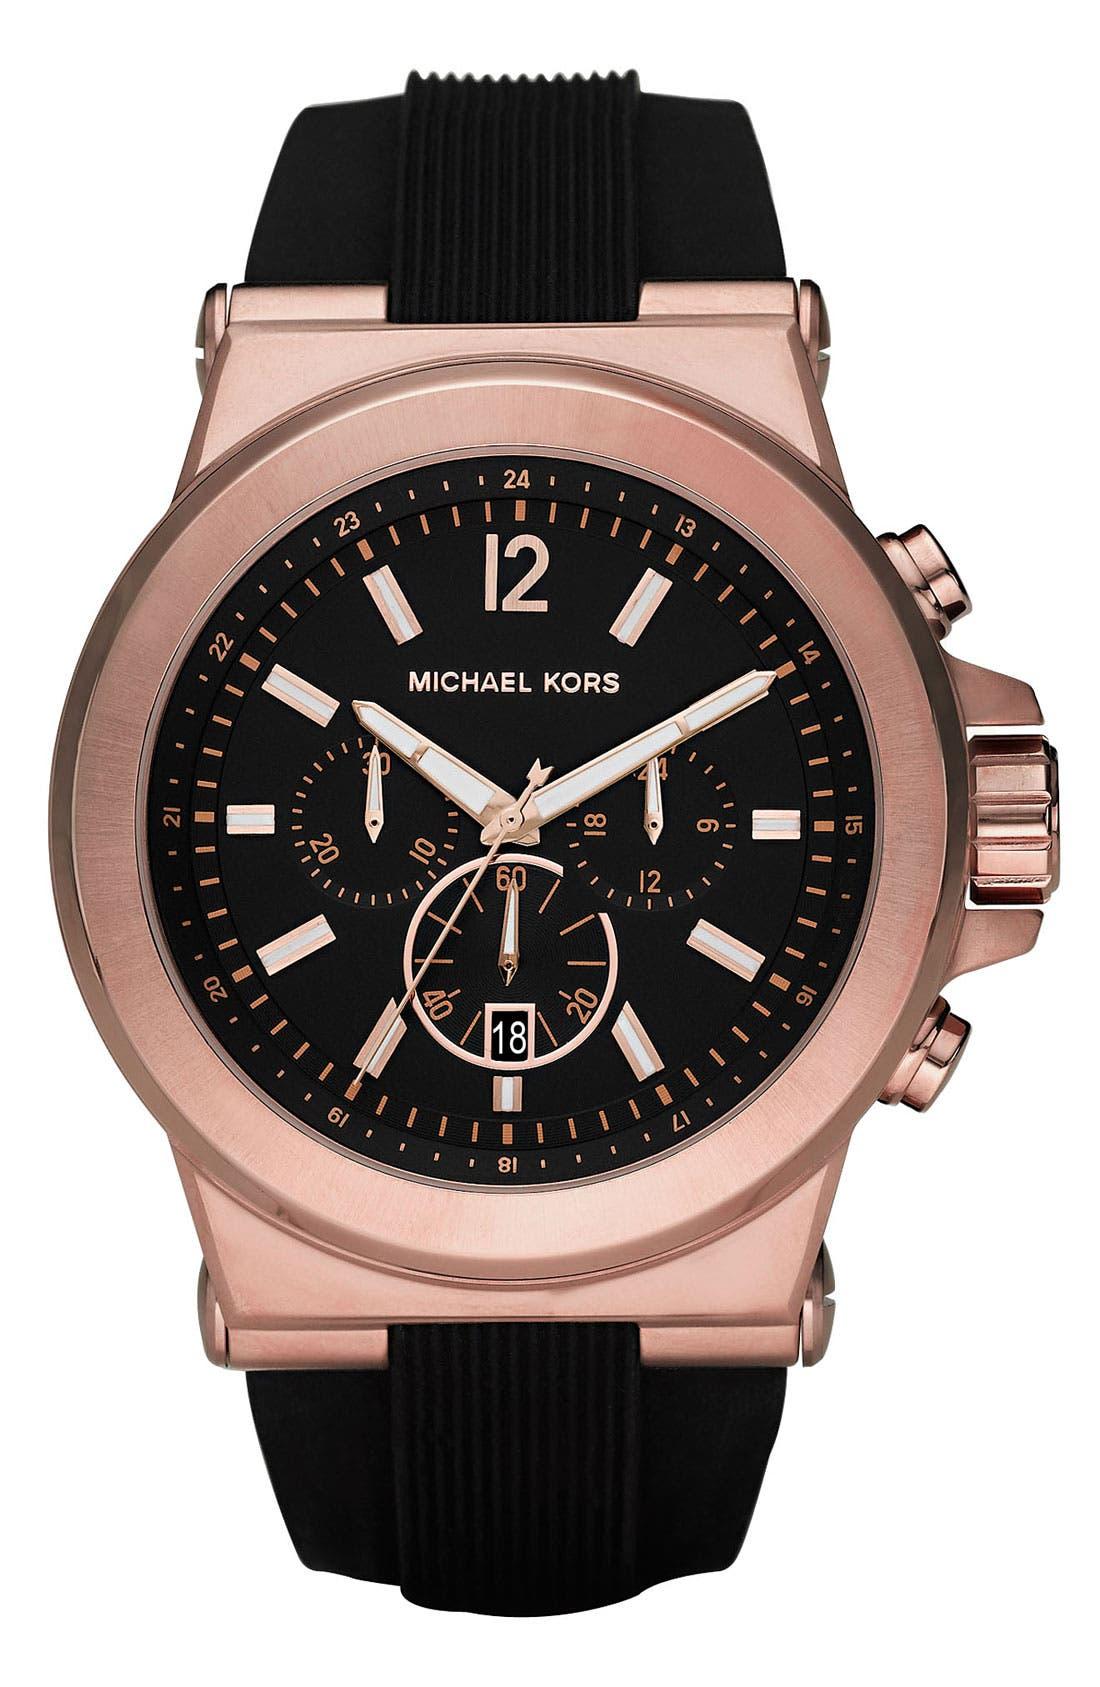 MICHAEL KORS, Chronograph Watch, 45mm, Main thumbnail 1, color, ROSE GOLD/ BLACK